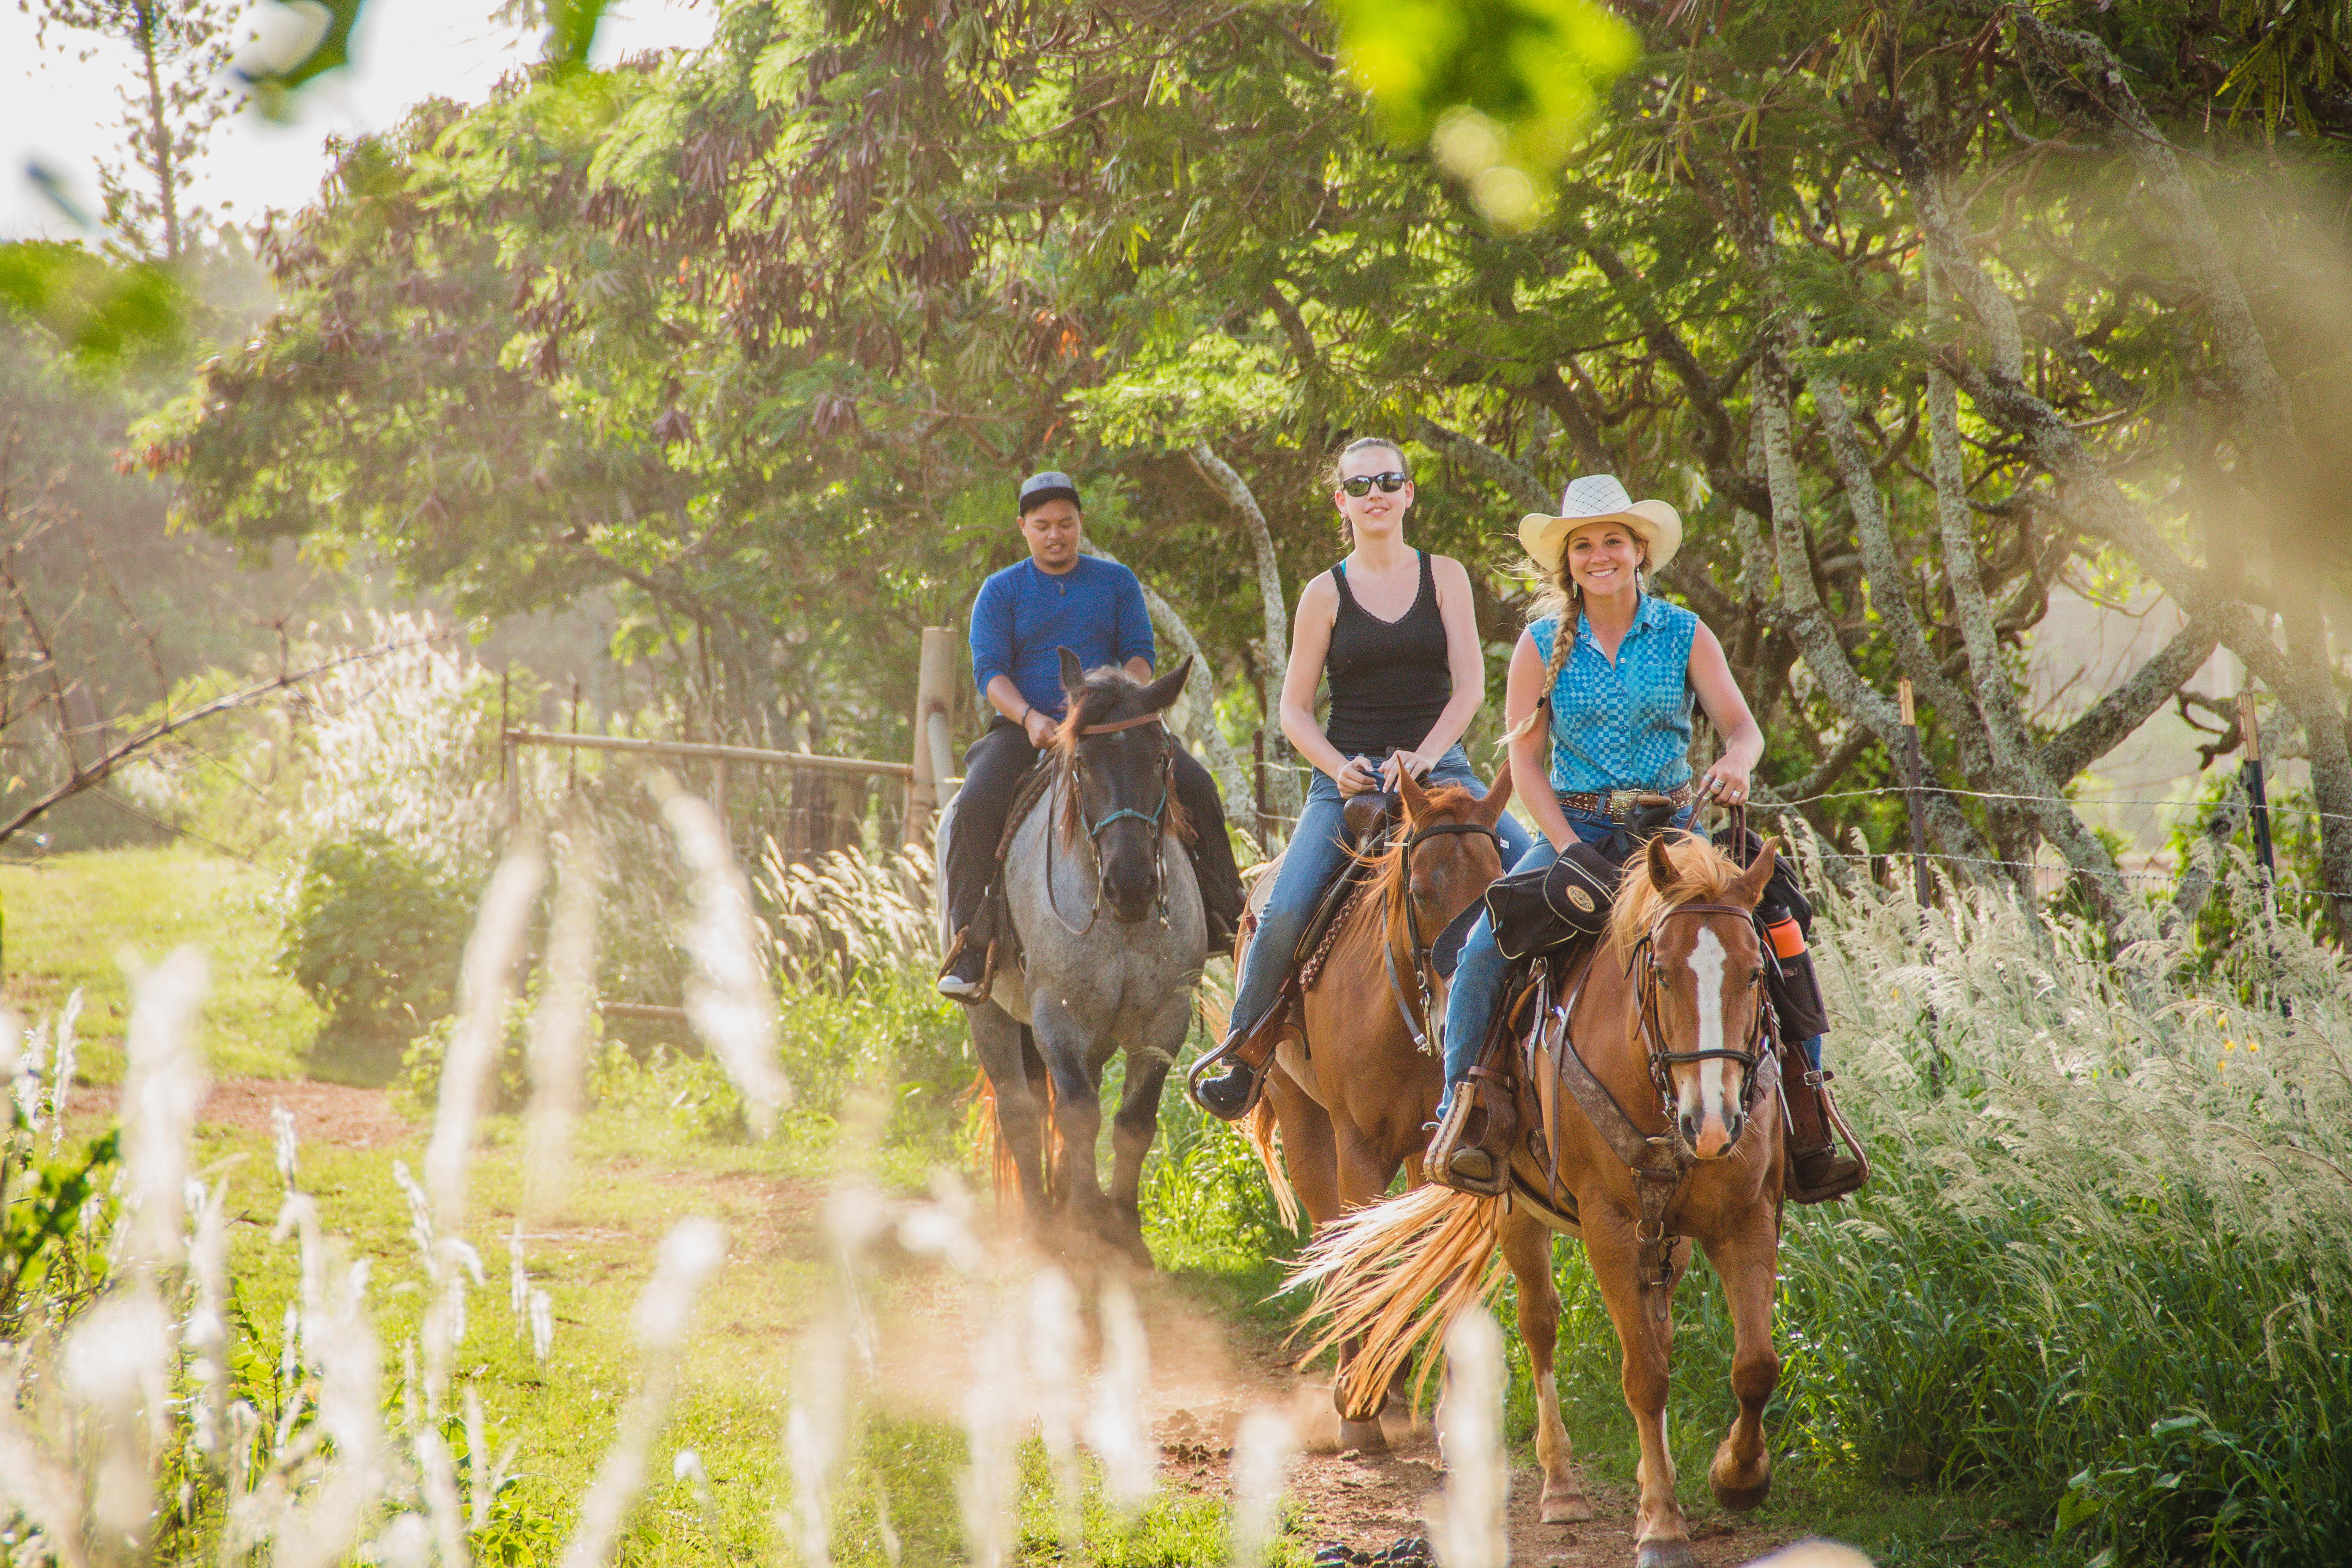 Product Scenic Horseback Ride